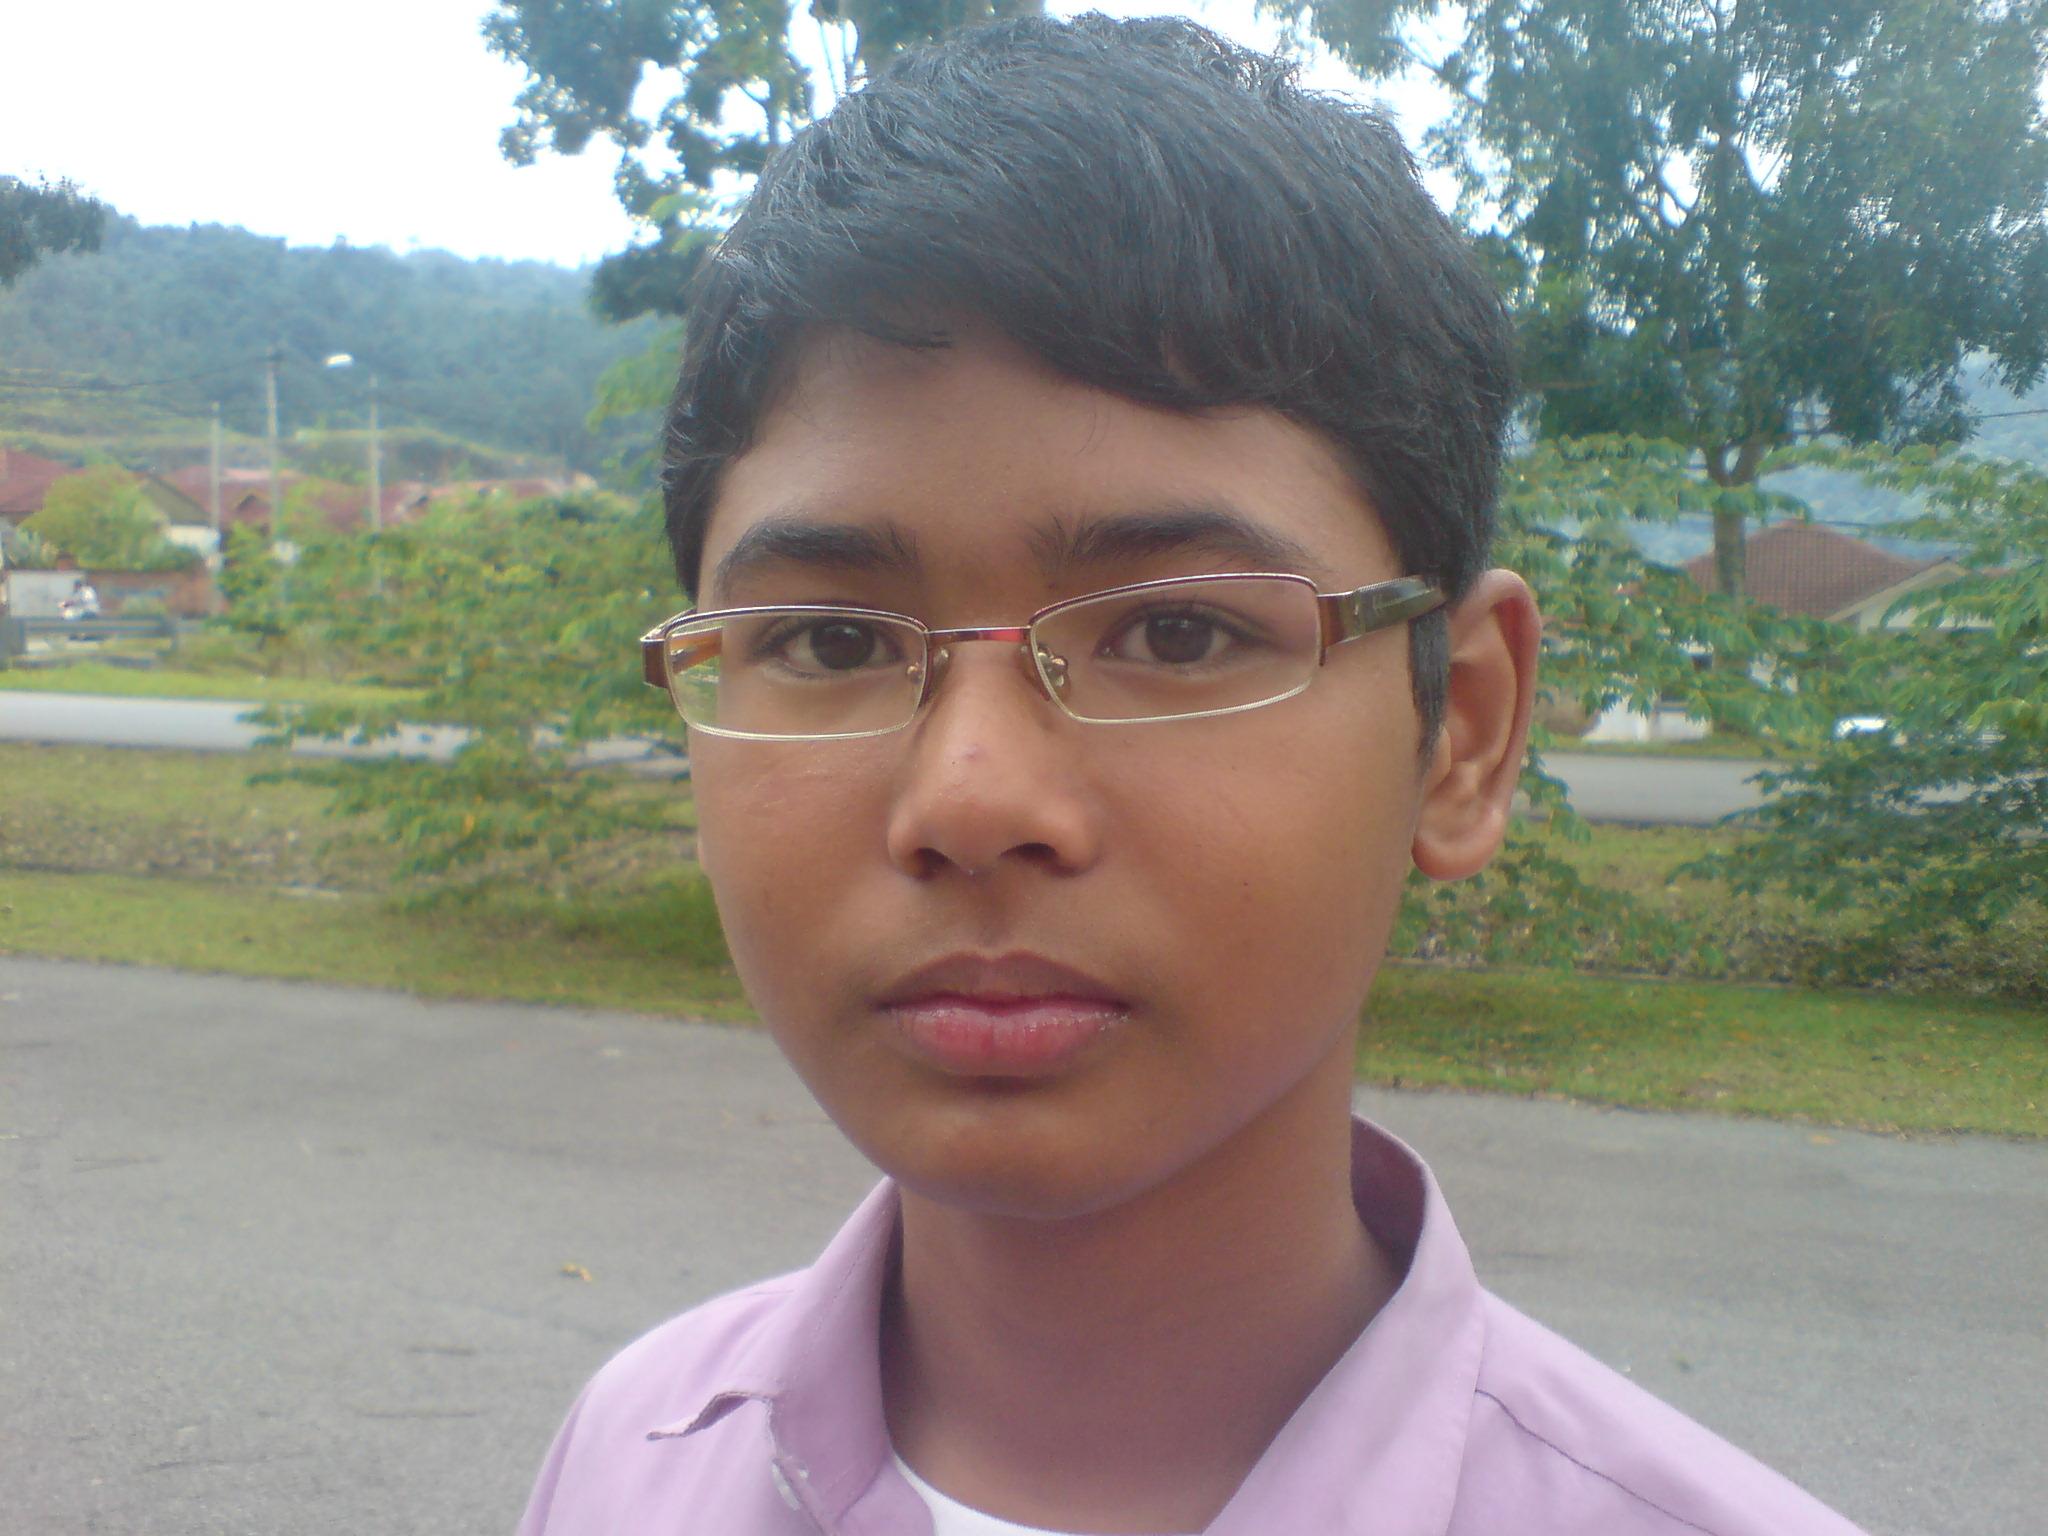 Batang Lelaki Melayu